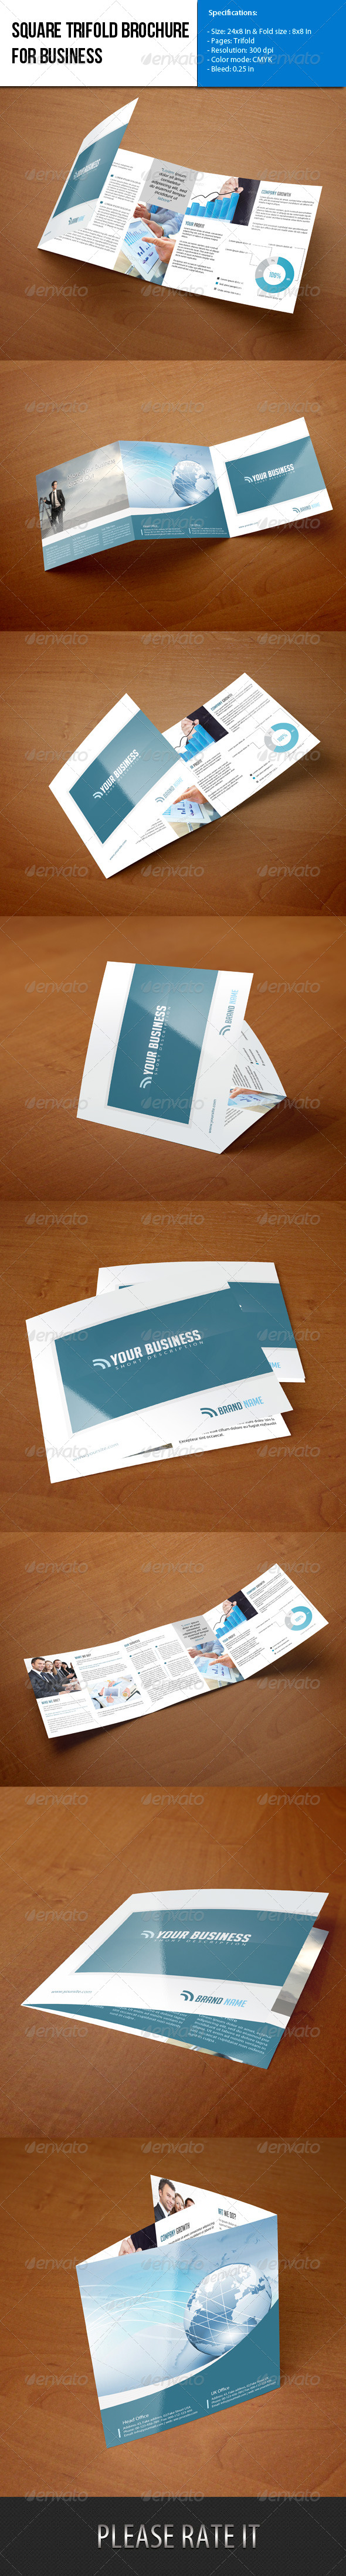 GraphicRiver Square Trifold Brochure-Business 5949164